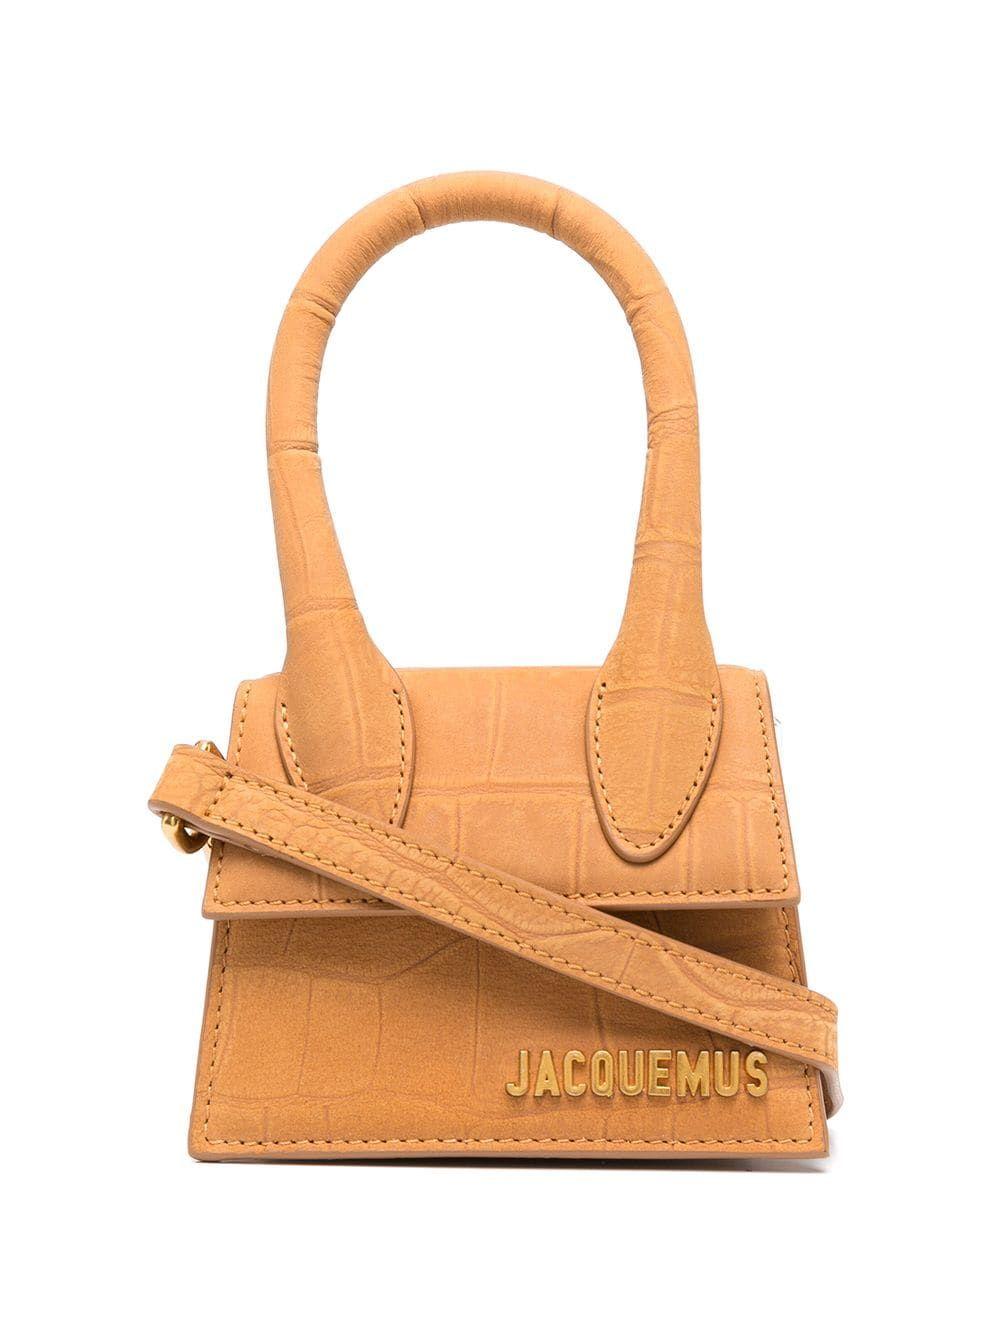 Jacquemus JACQUEMUS WOMEN'S BROWN LEATHER HANDBAG